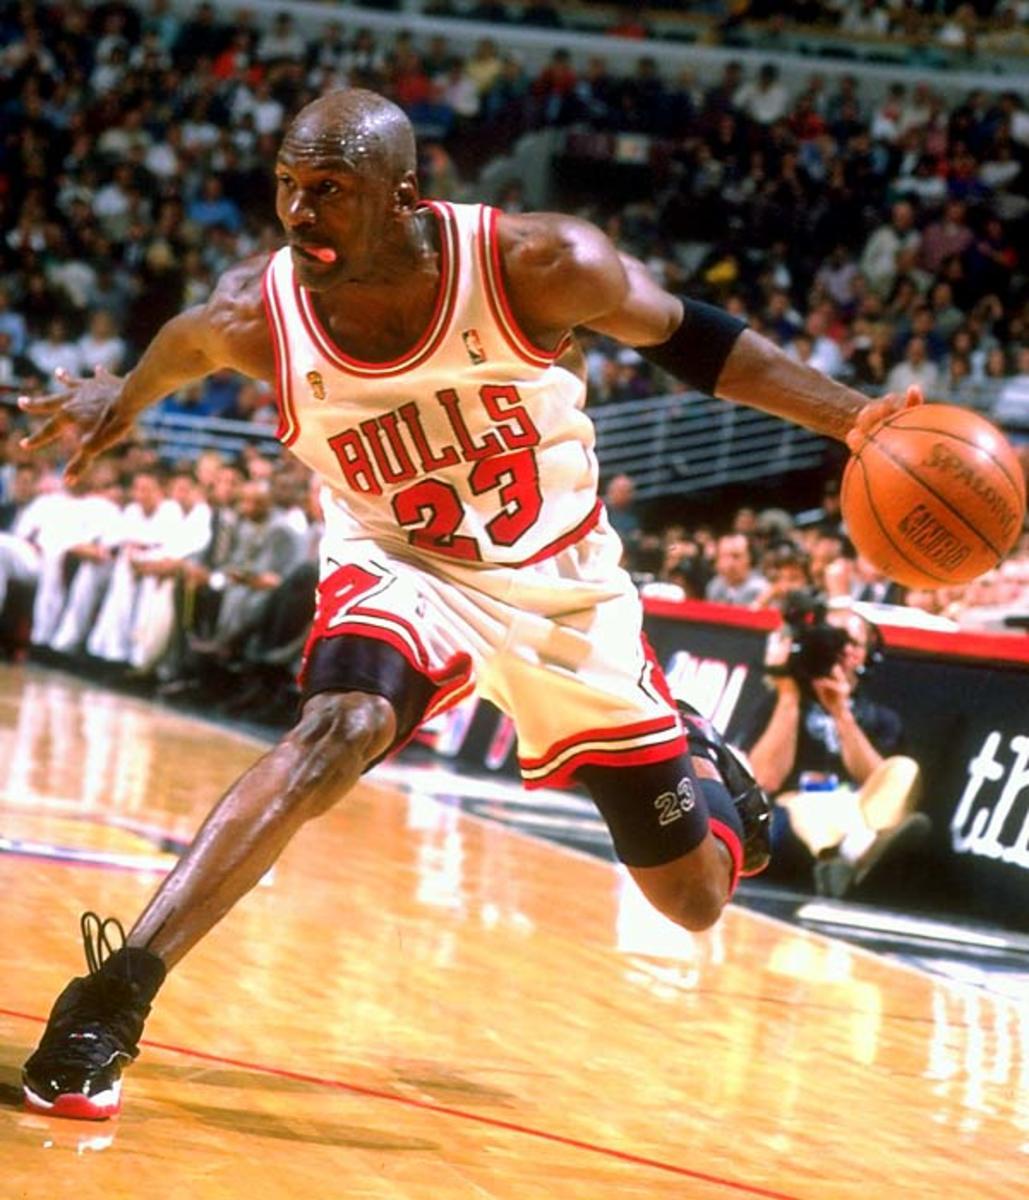 1995-96 Chicago Bulls